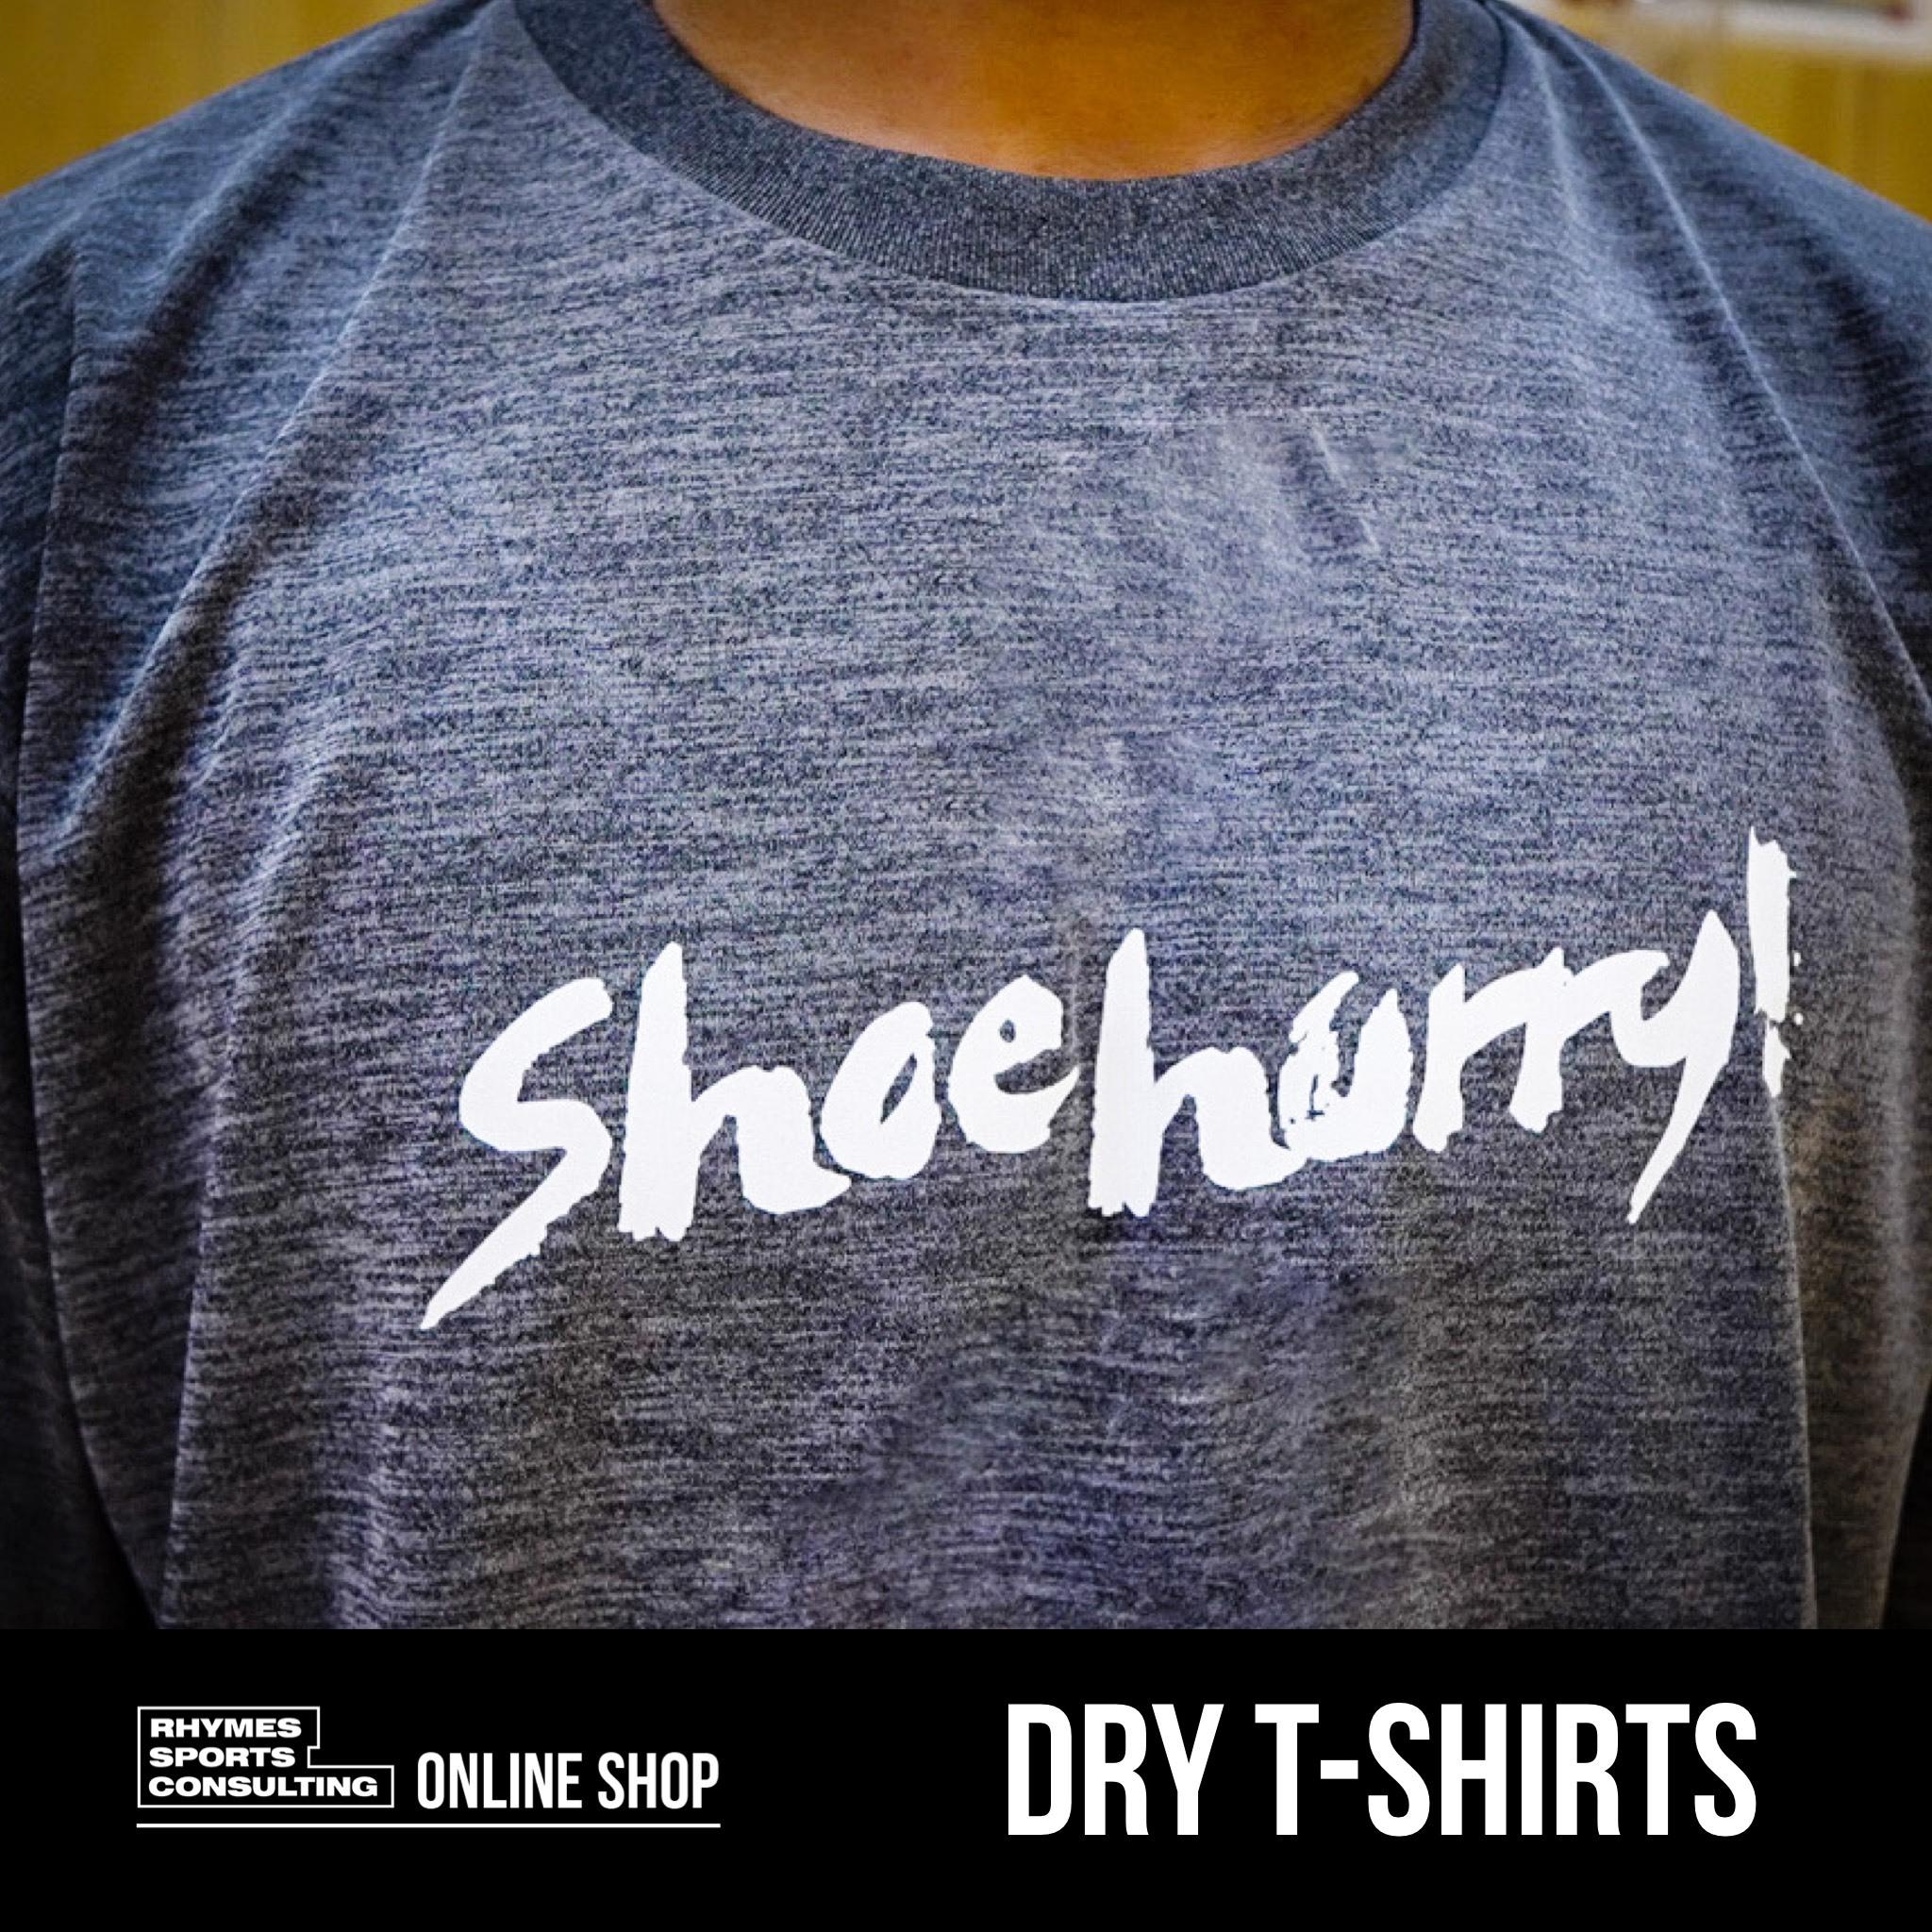 SHOEHURRY! ドライTシャツ(グレー×ホワイト)